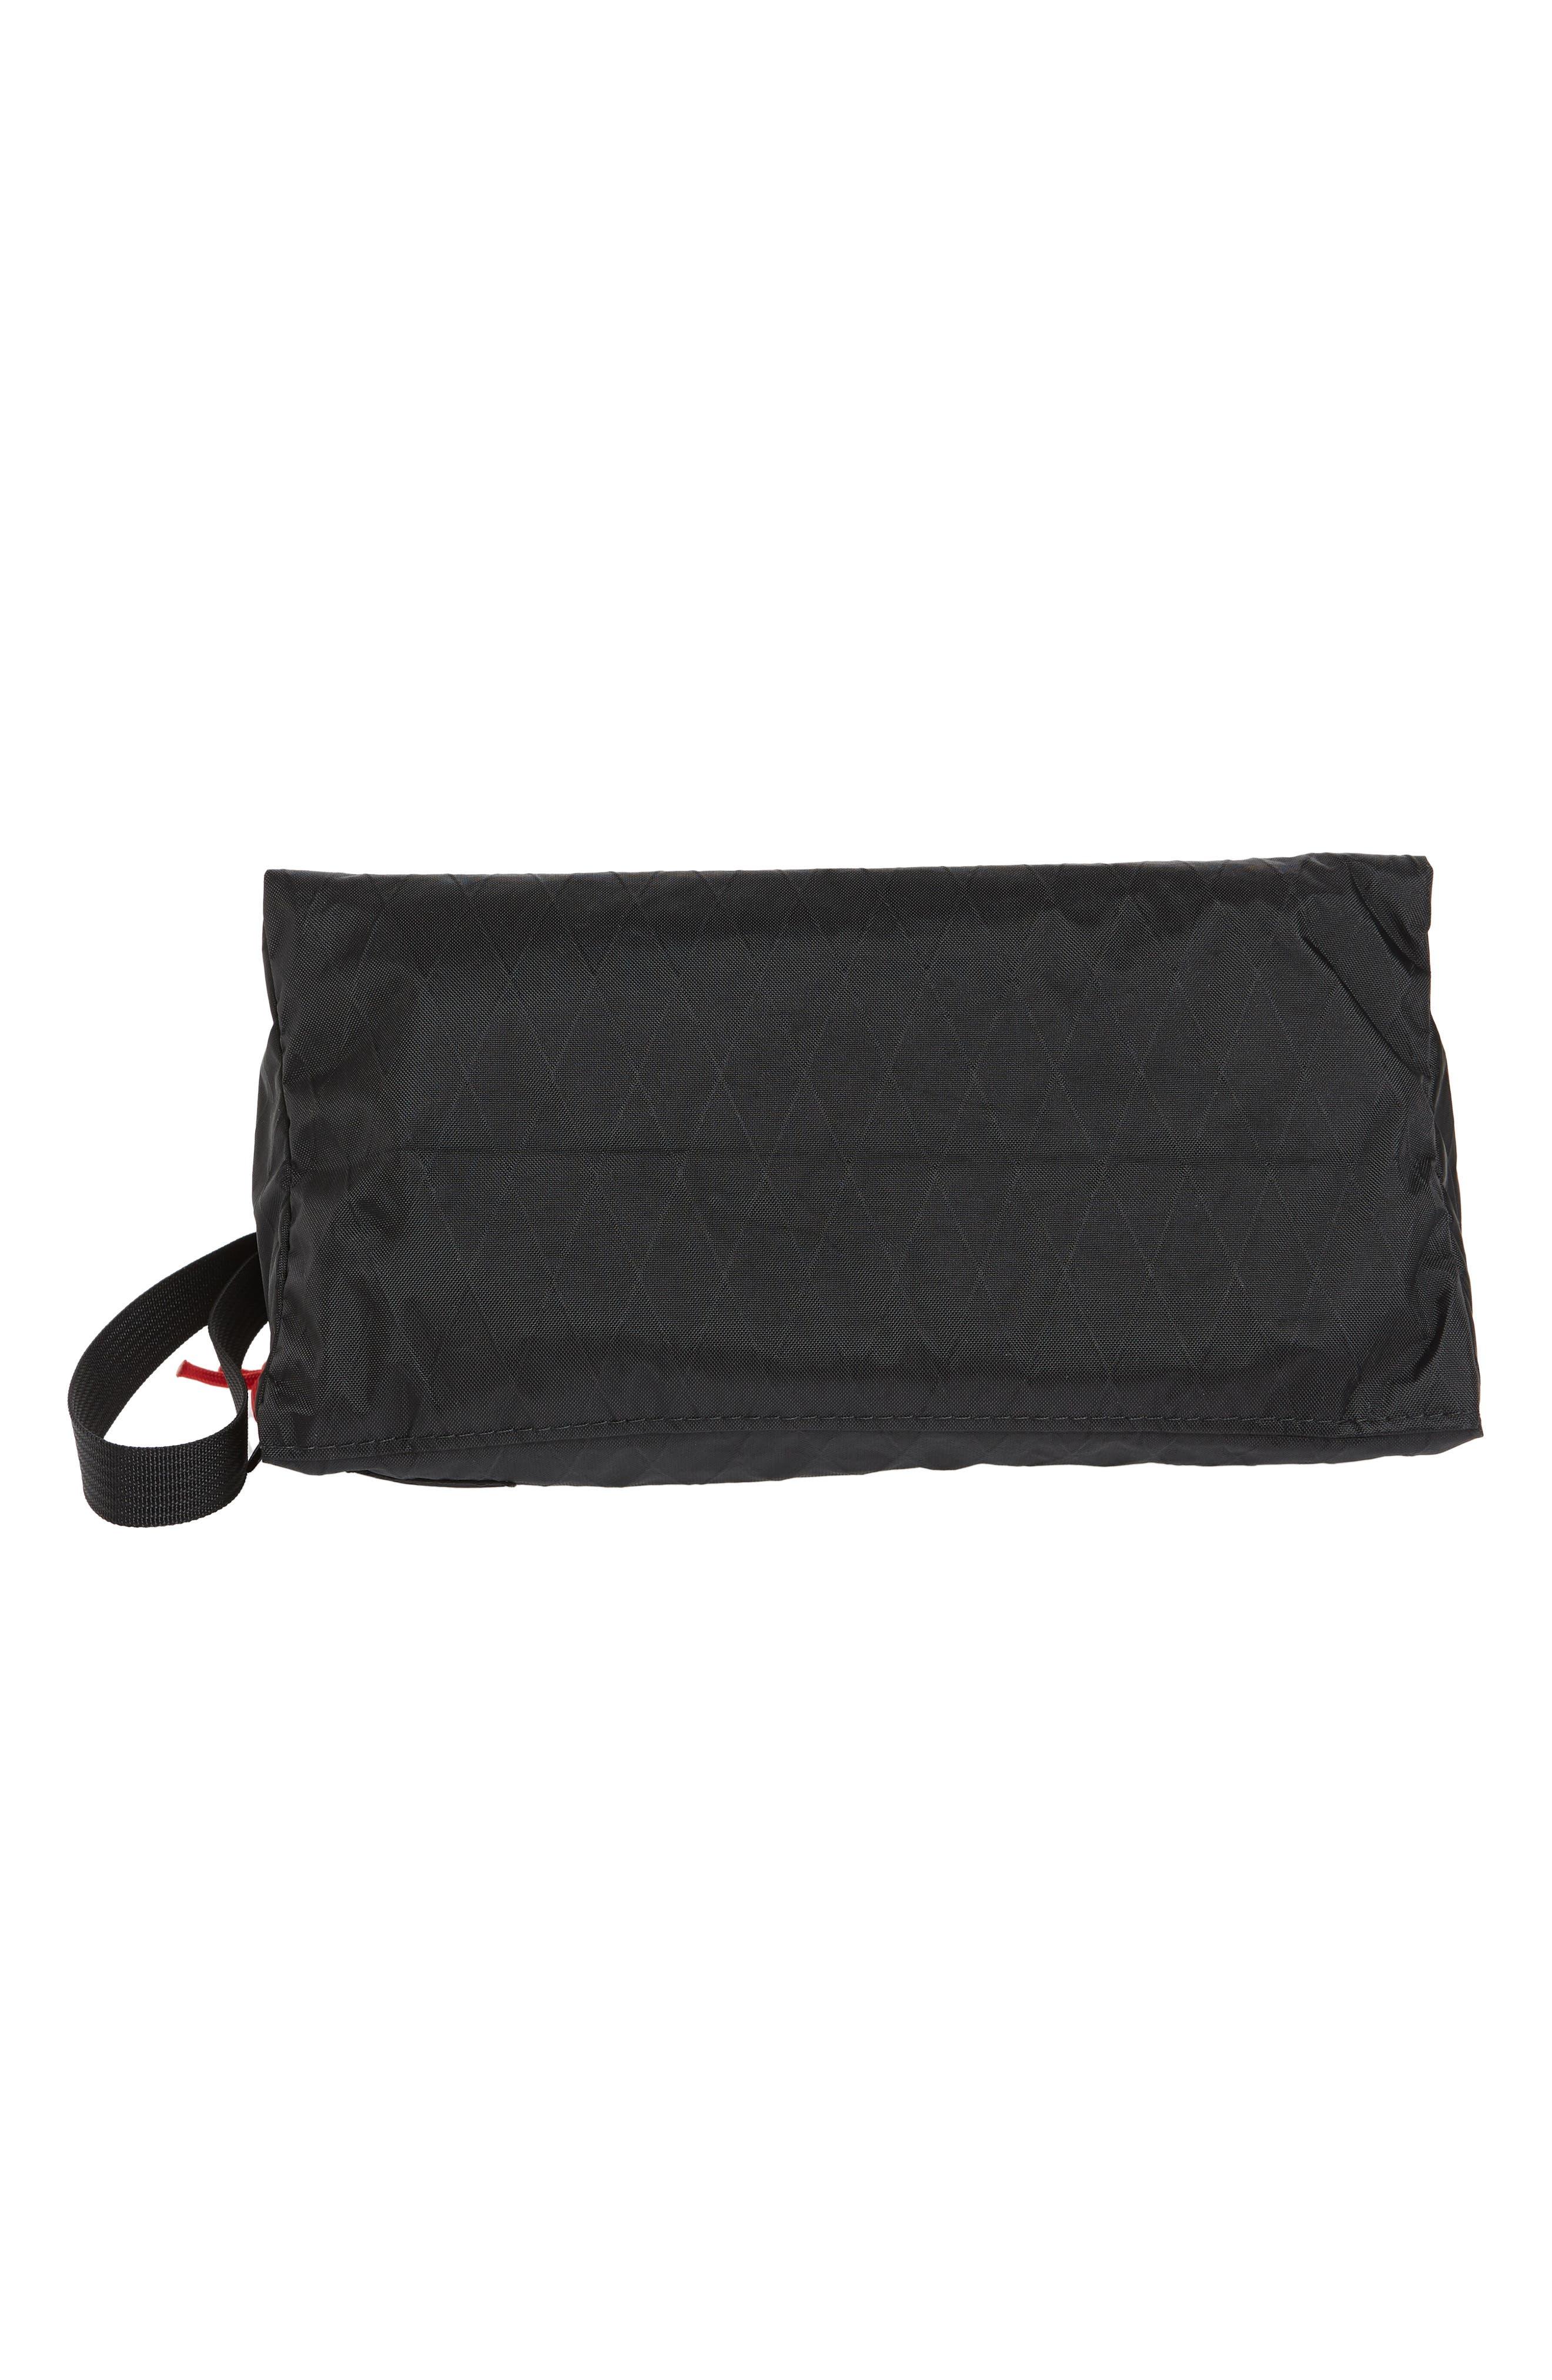 X-Pac Dopp Kit,                             Alternate thumbnail 5, color,                             X-PAC BLACK